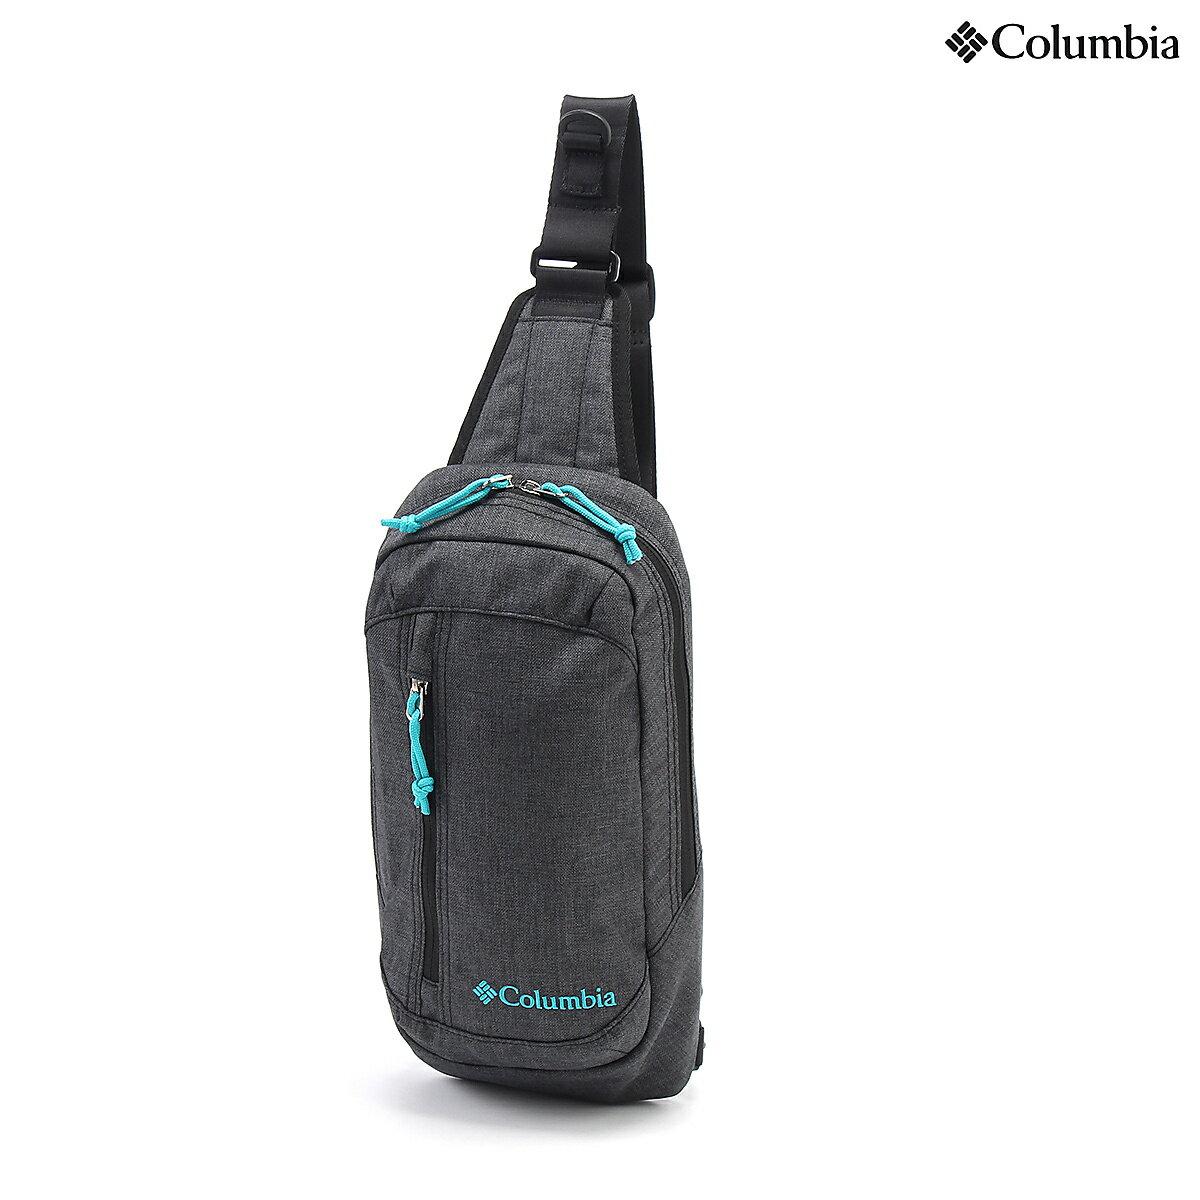 Columbia (コロンビア) トレッキング アウトドア ショルダーバック ヤムヒルフォークボディーバッグ O/S BLACK PU8156-010